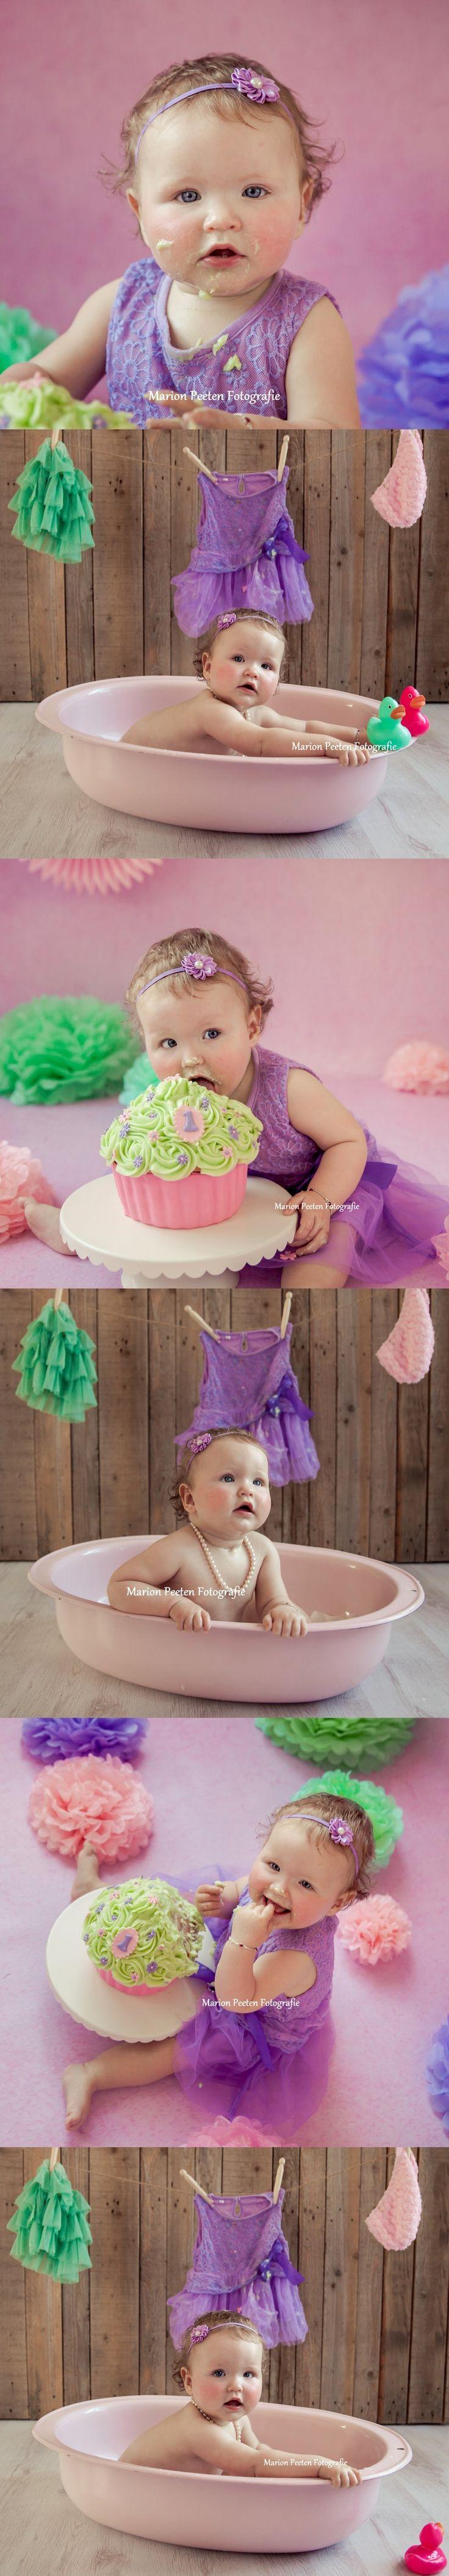 cake smash fotoshoot#taart fotoshoot#verjaardag fotoshoot#cake smash shoot# birthday shoot# one year old photoshoot#marion peeten fotografie#birthday girl# bathtub photoshoot#